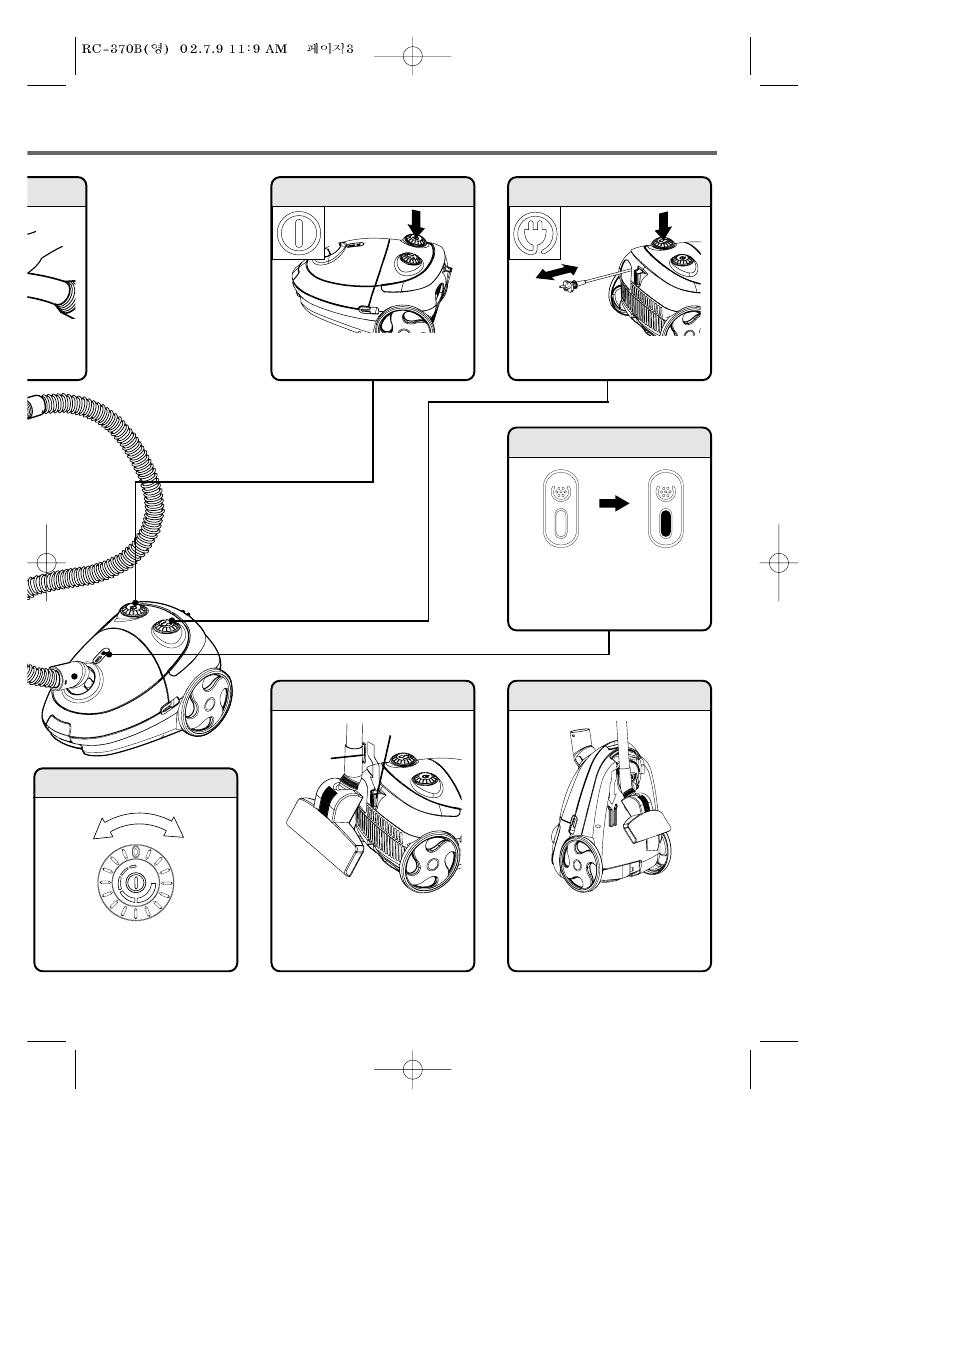 Daewoo RC-370B User Manual | Page 3 / 6